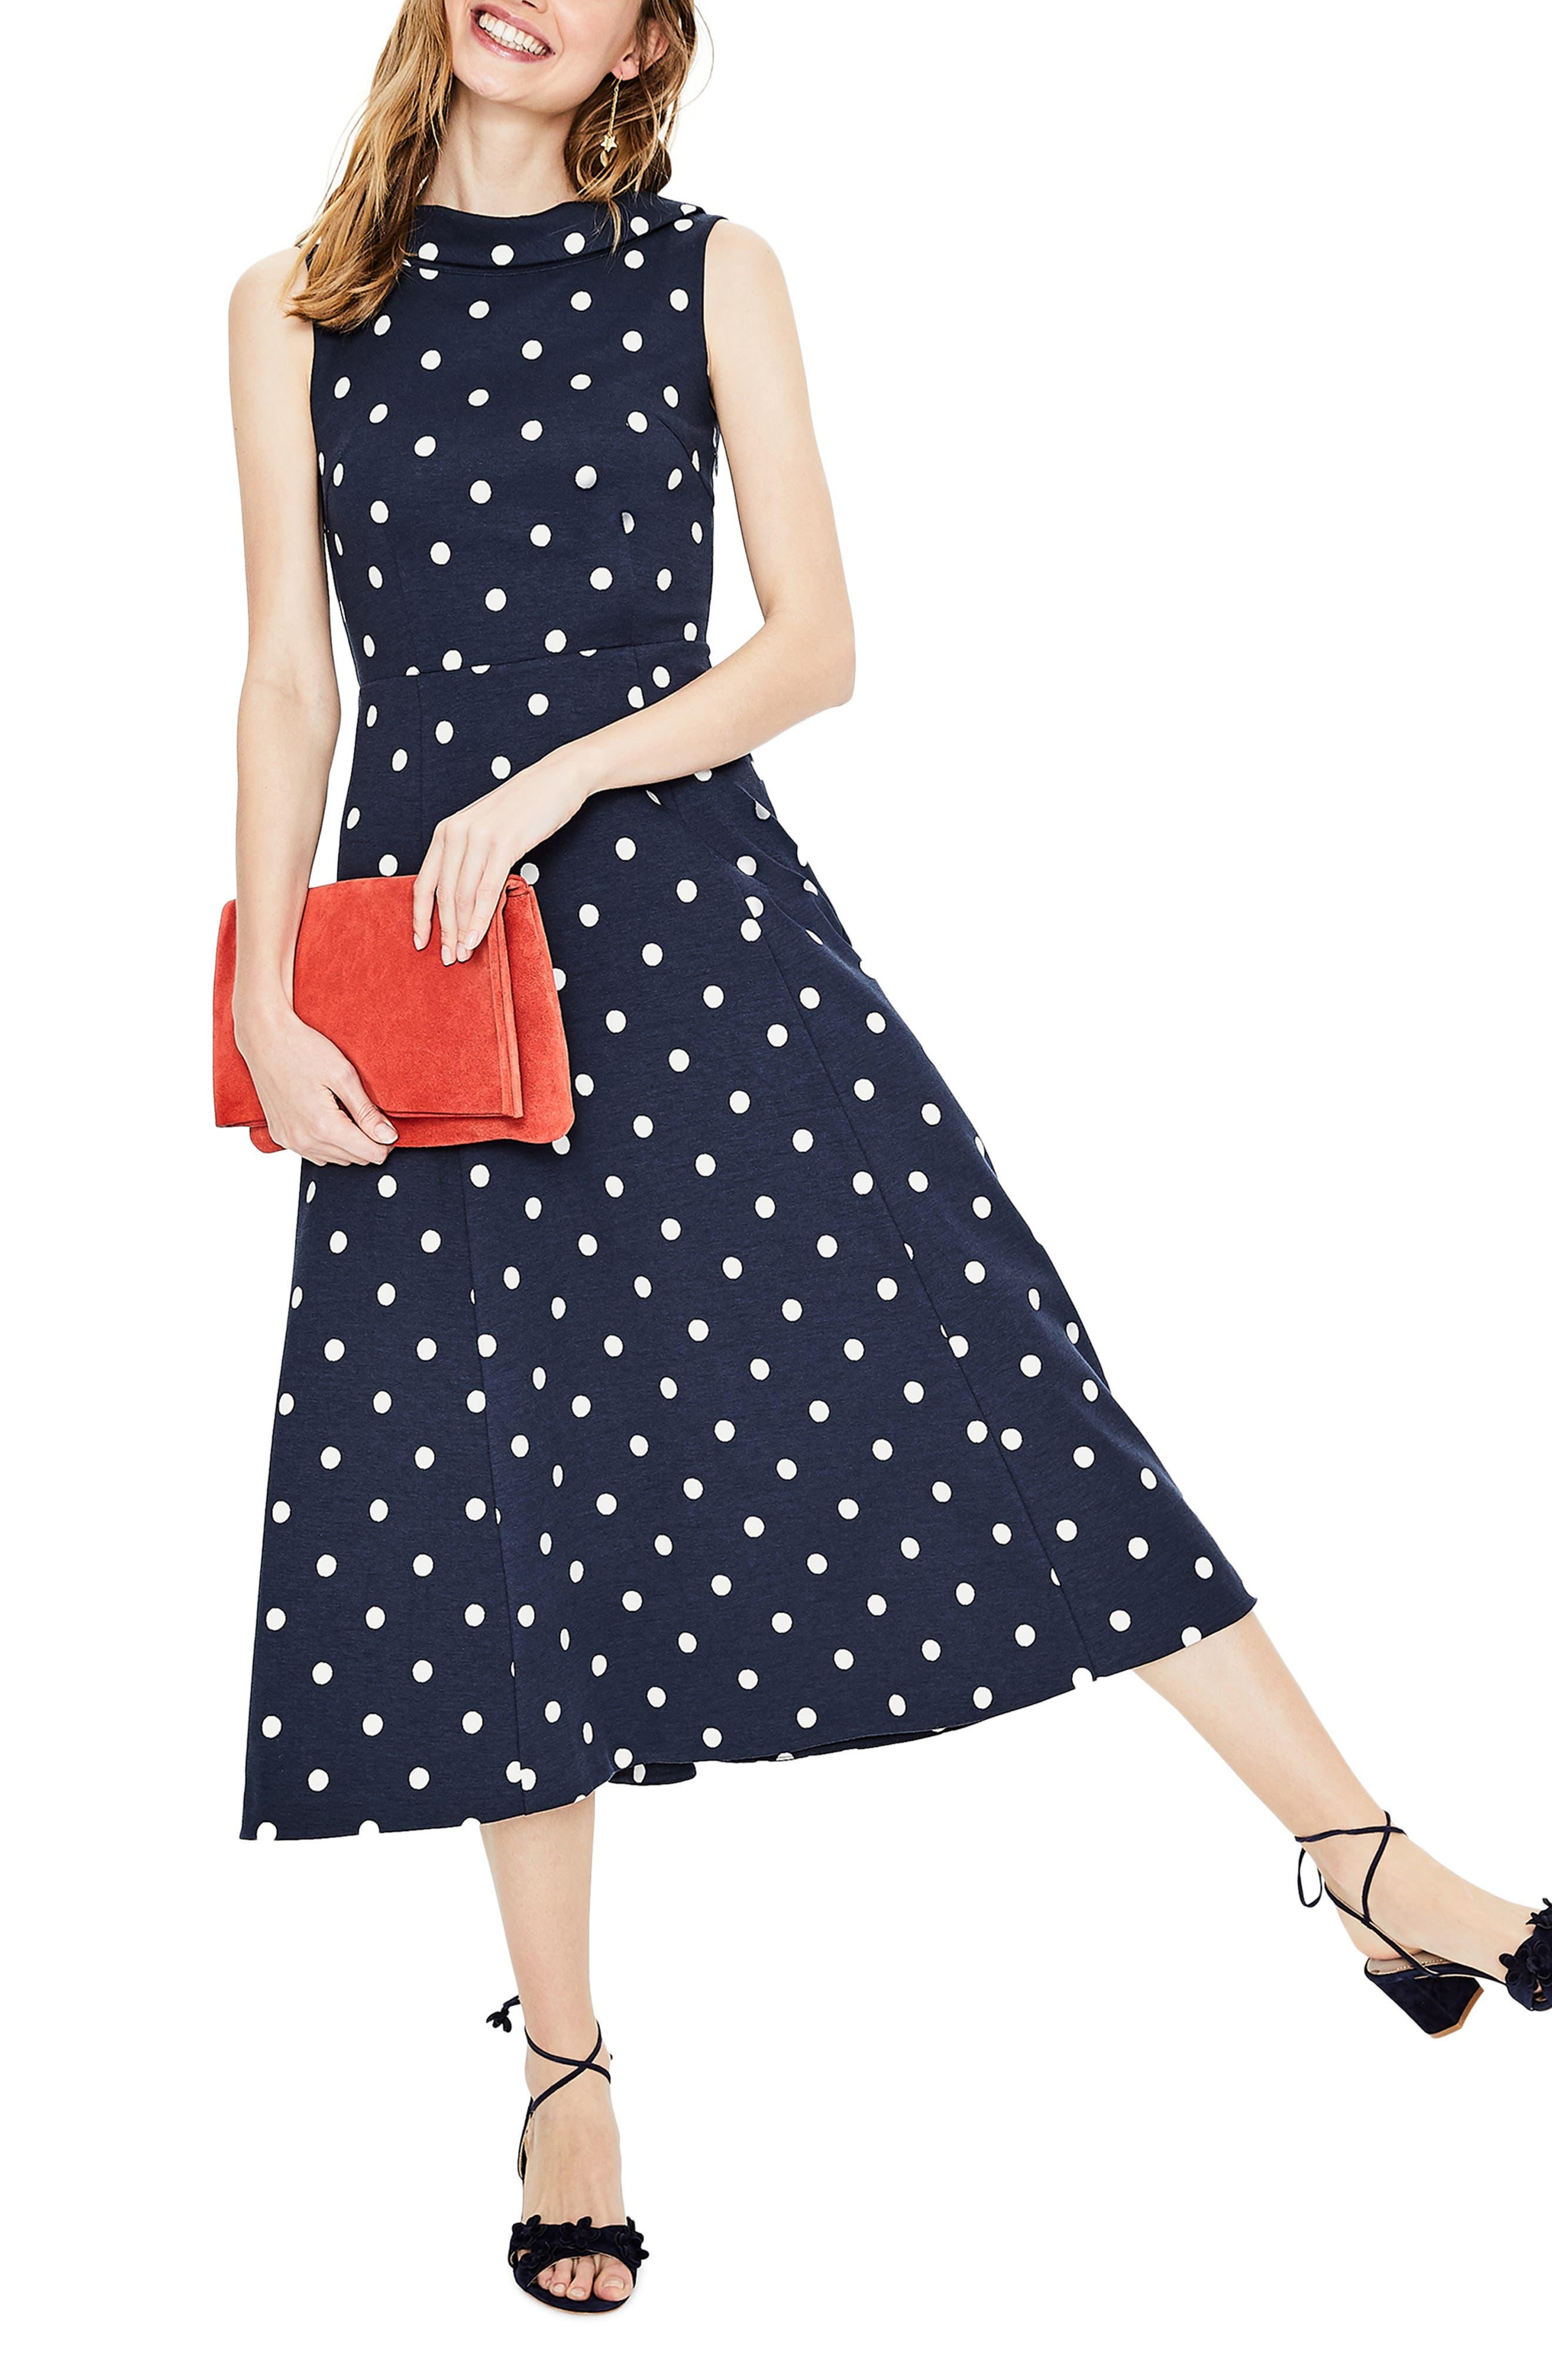 Polka Dot Dresses: 20s, 30s, 40s, 50s, 60s Womens Boden Aria Ponte Midi Dress Size 14 - Blue $170.00 AT vintagedancer.com